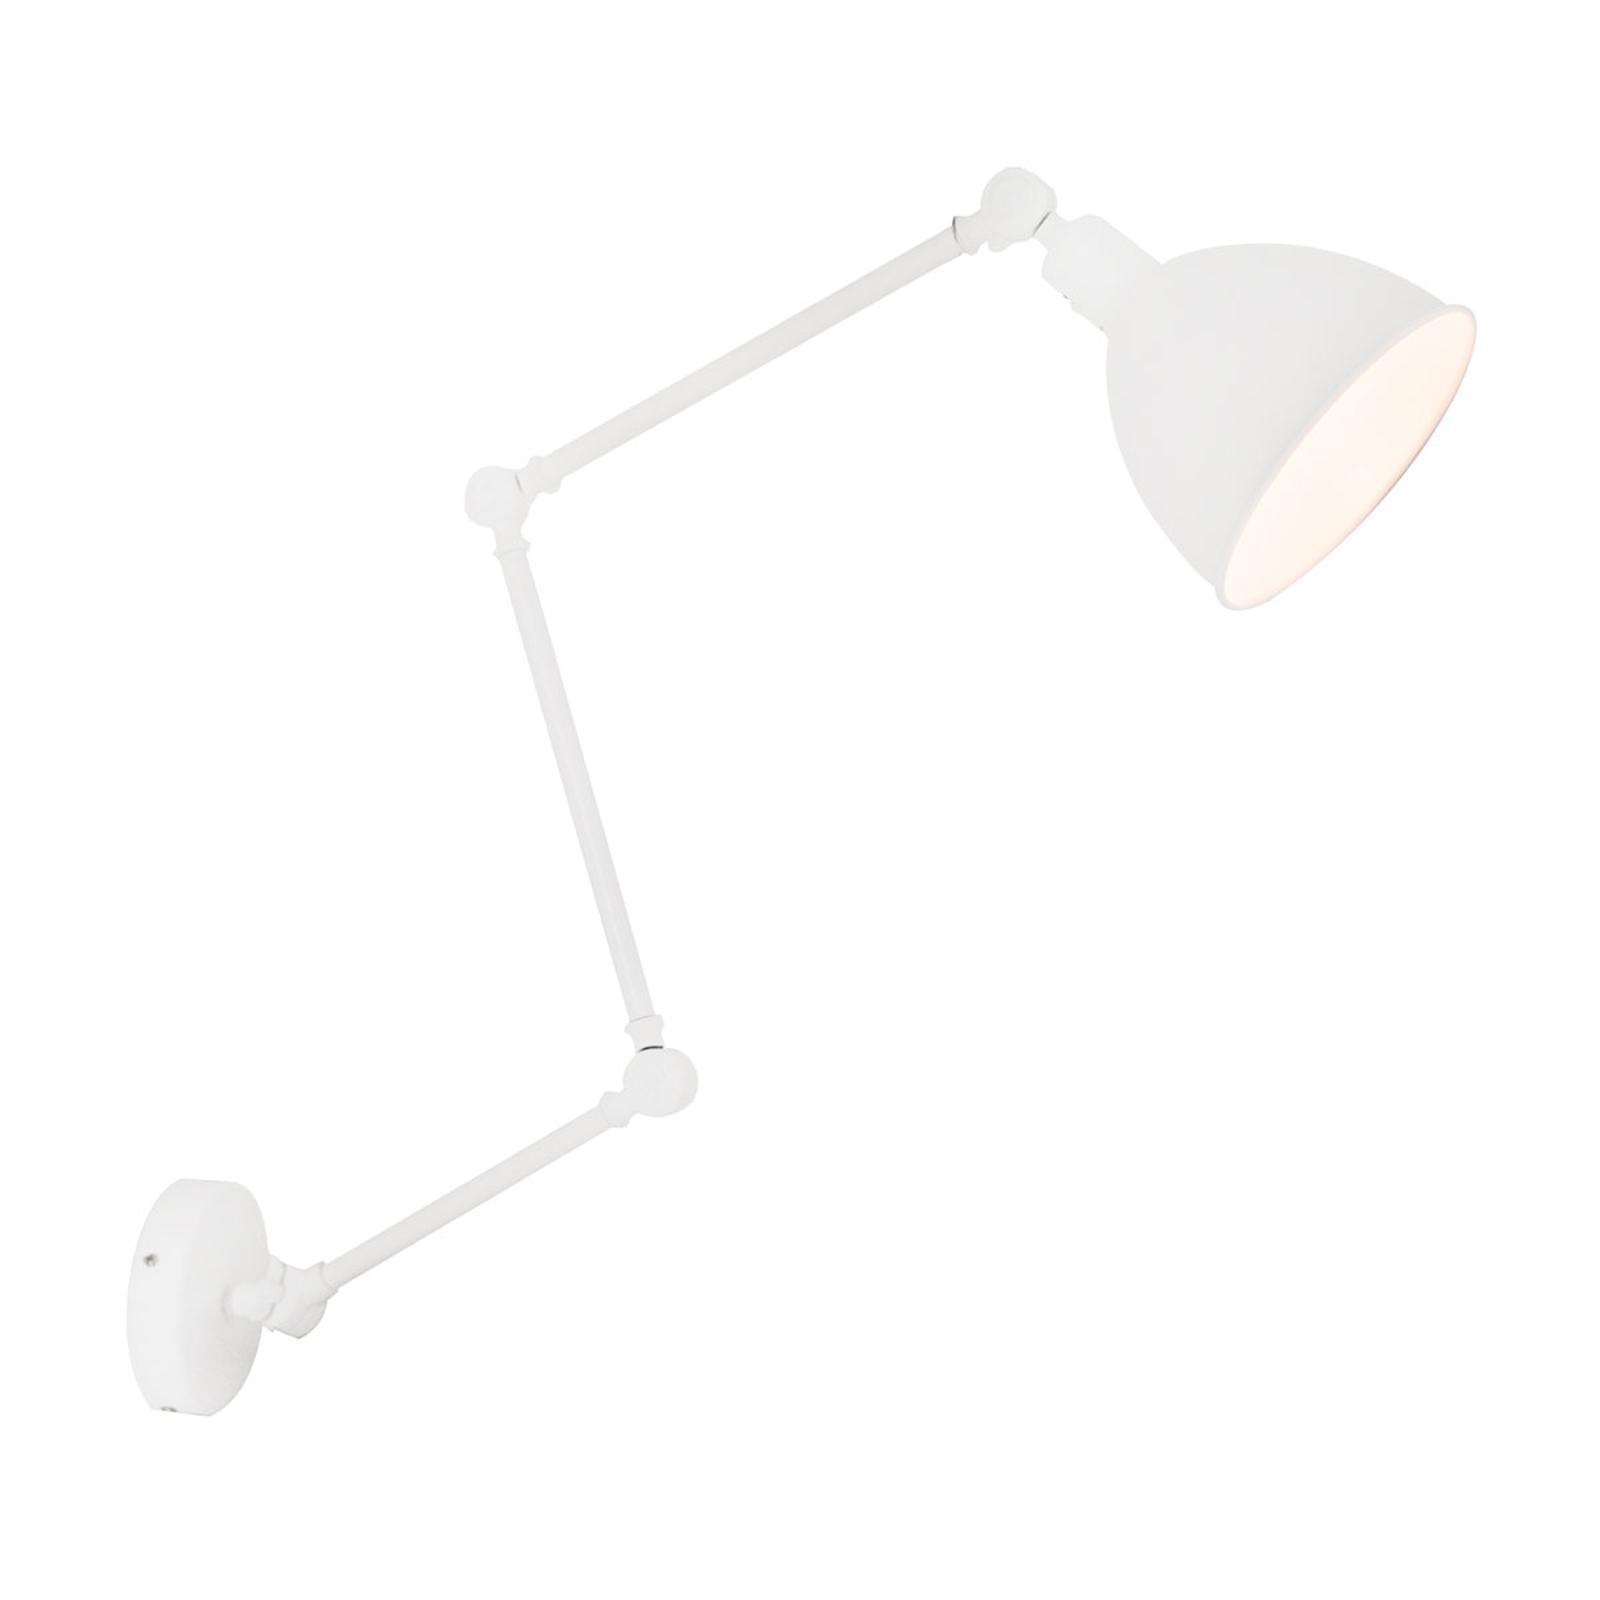 By Rydéns Bazar wandlamp met stekker, zandwit